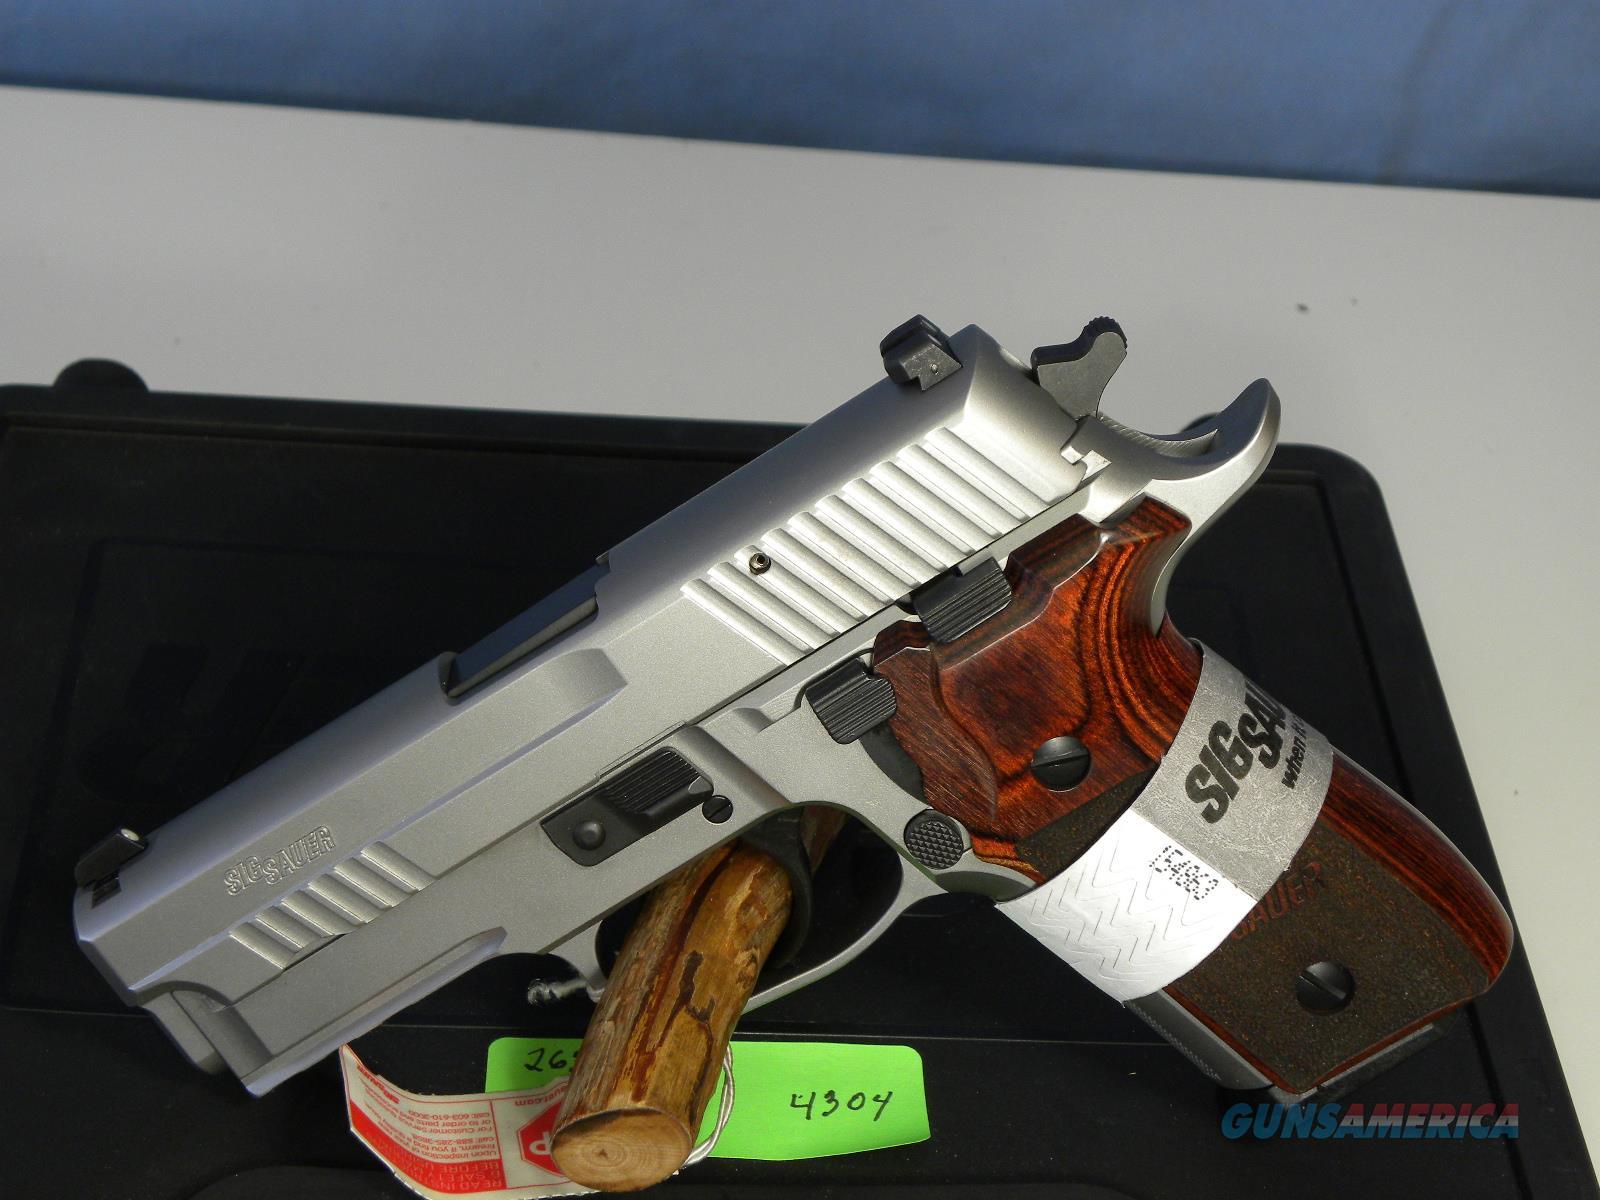 Sig Sauer 229R-40-SSE Elite  Guns > Pistols > Sig - Sauer/Sigarms Pistols > P229